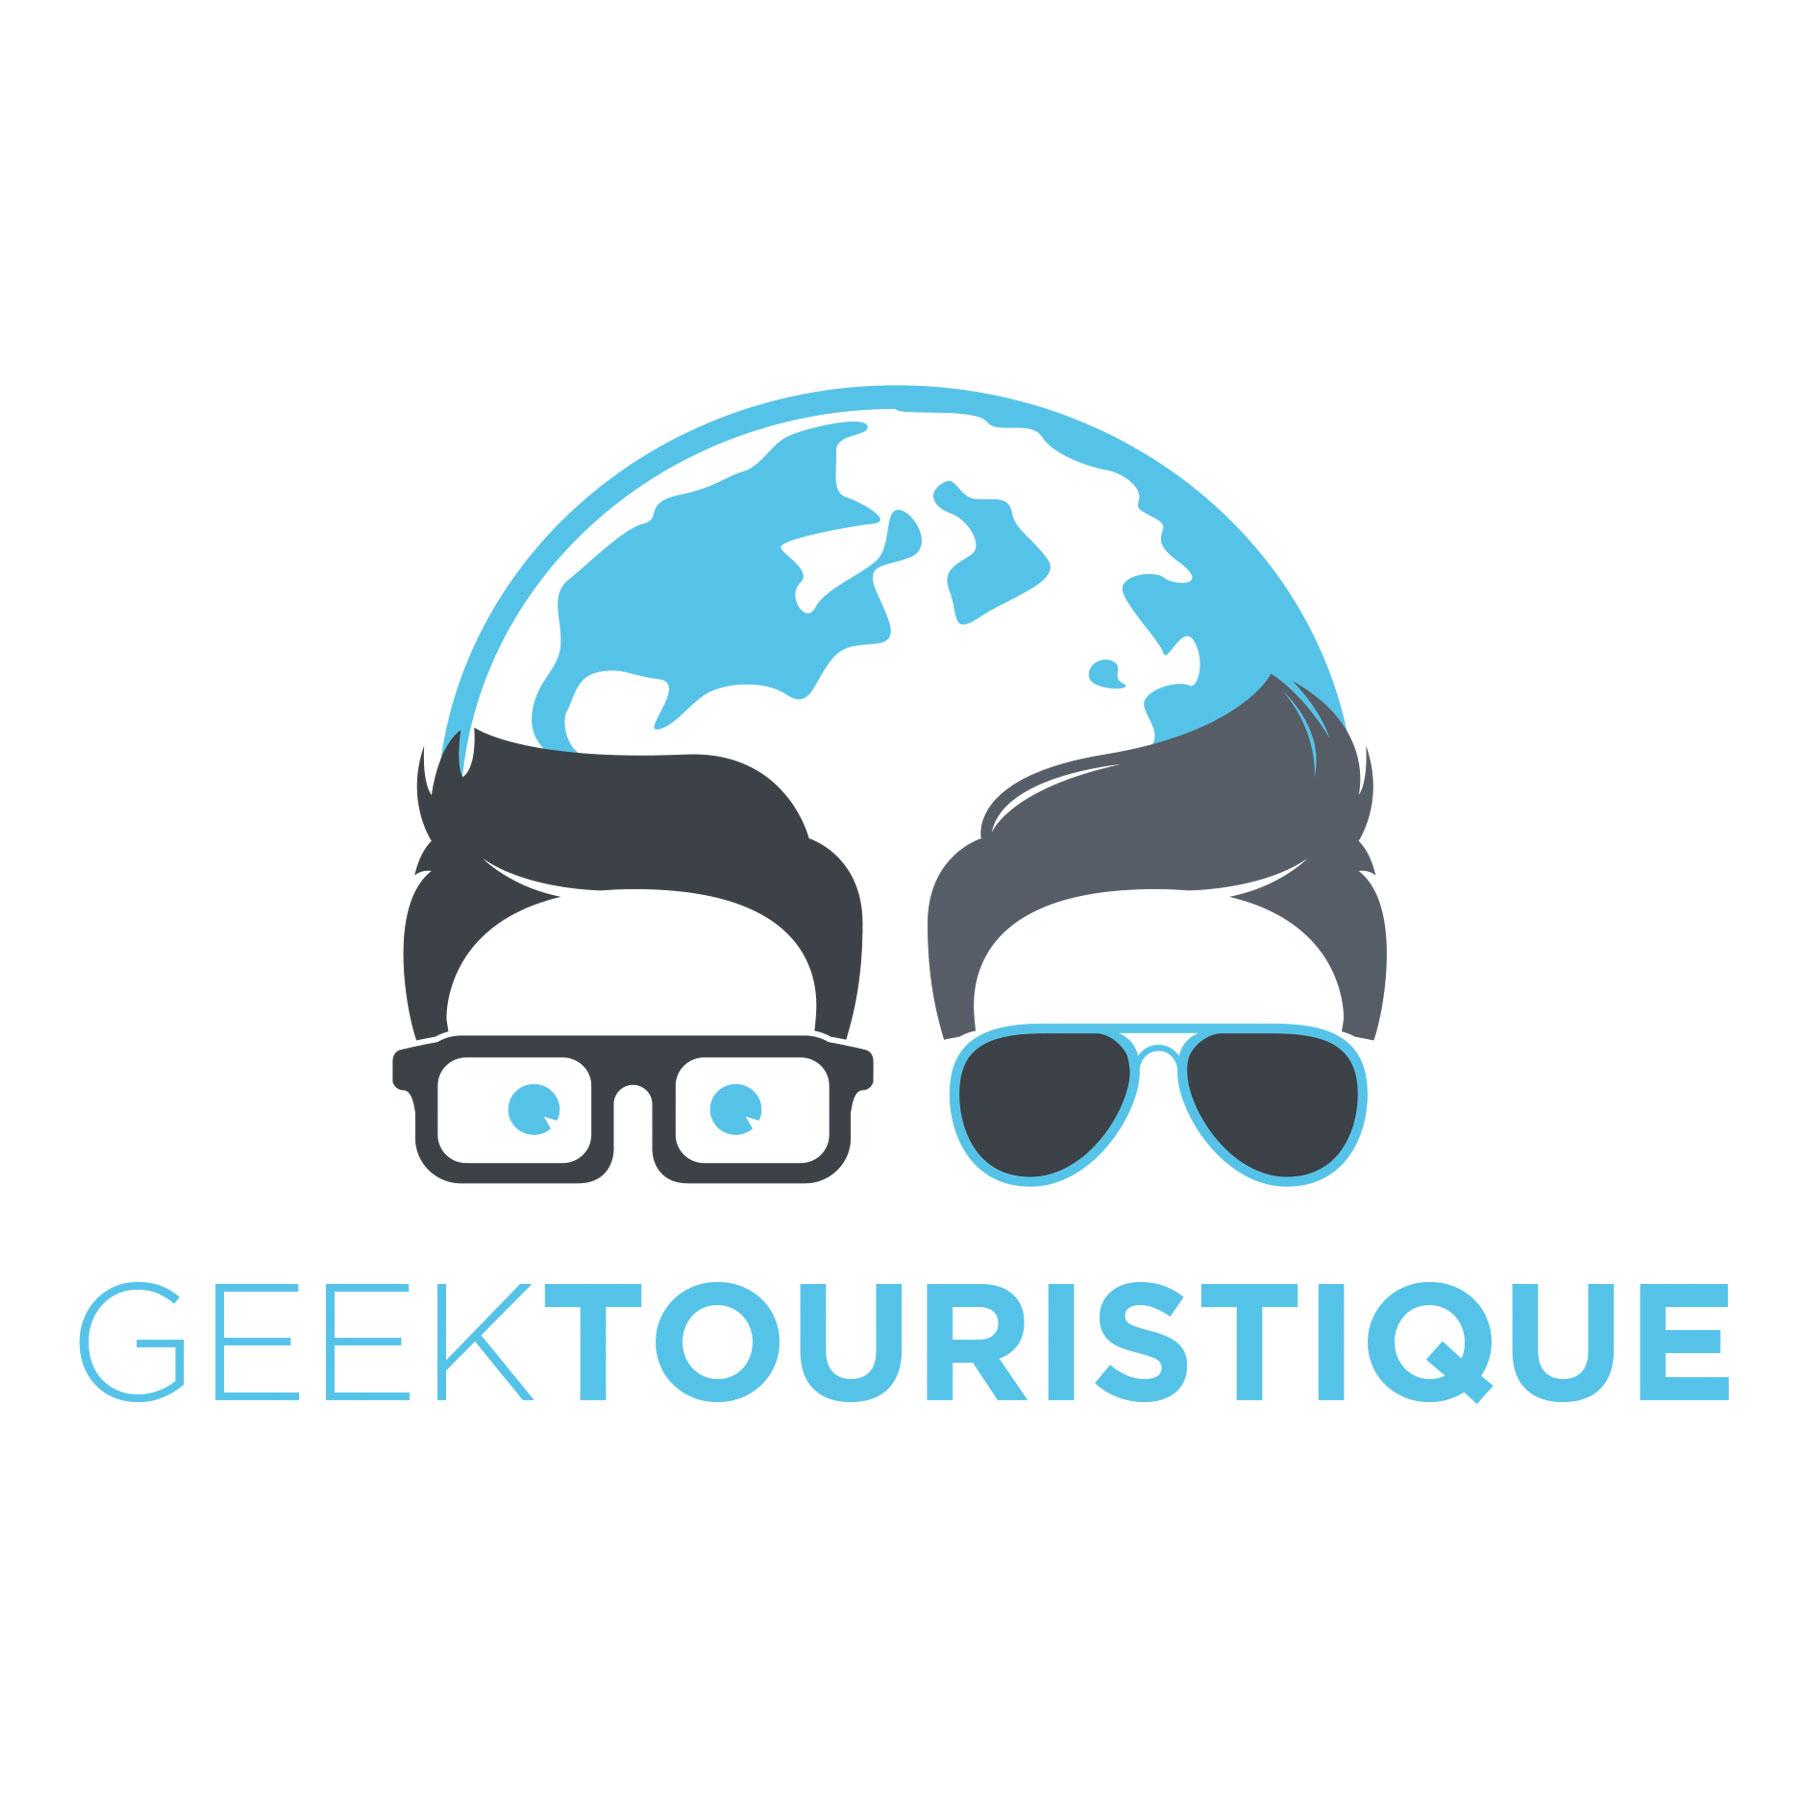 GeekTouristique